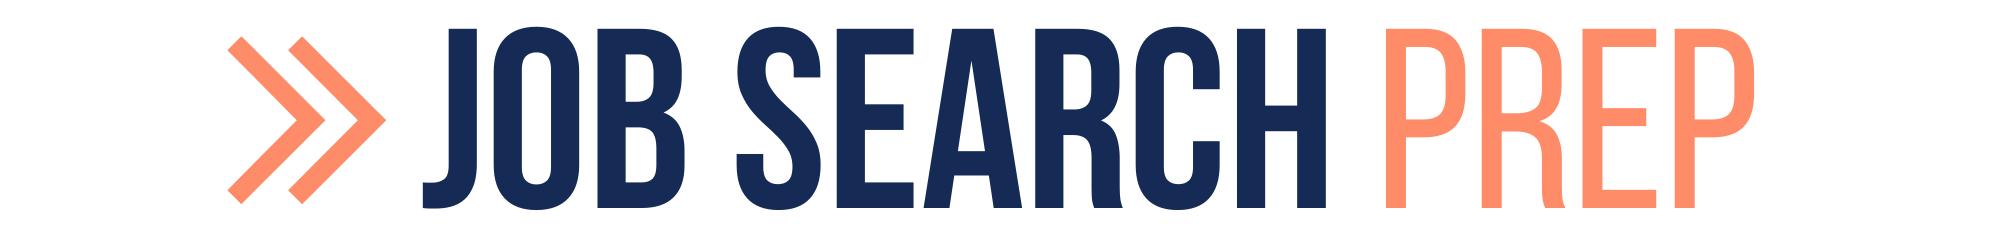 JOB SEARCH Prep Header LOGO 2021 - no tagline header - Fast Forward Your Career Success